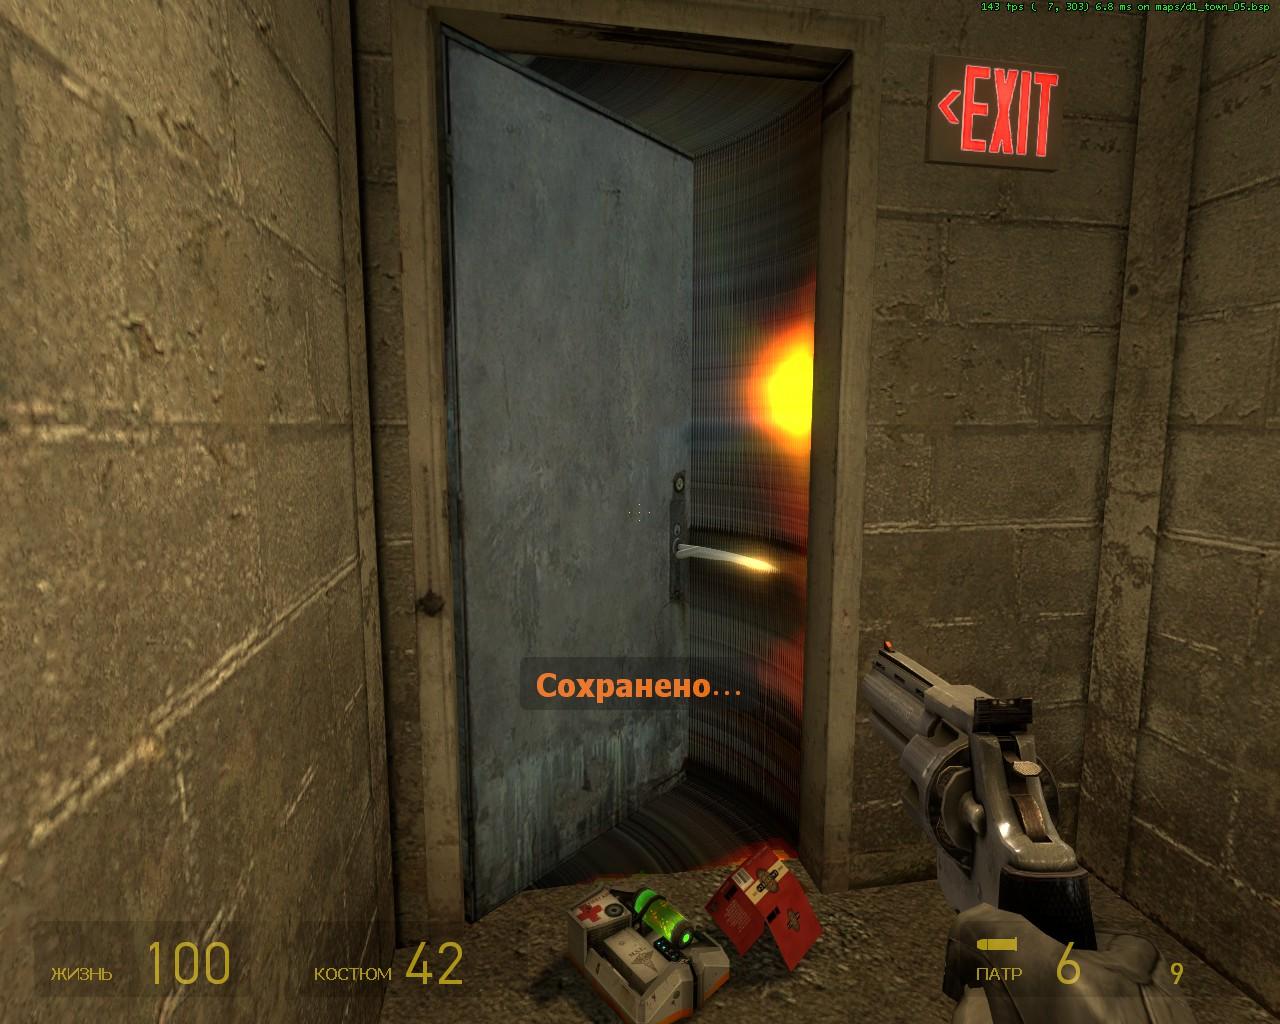 d1_town_050006.jpg - Half-Life 2